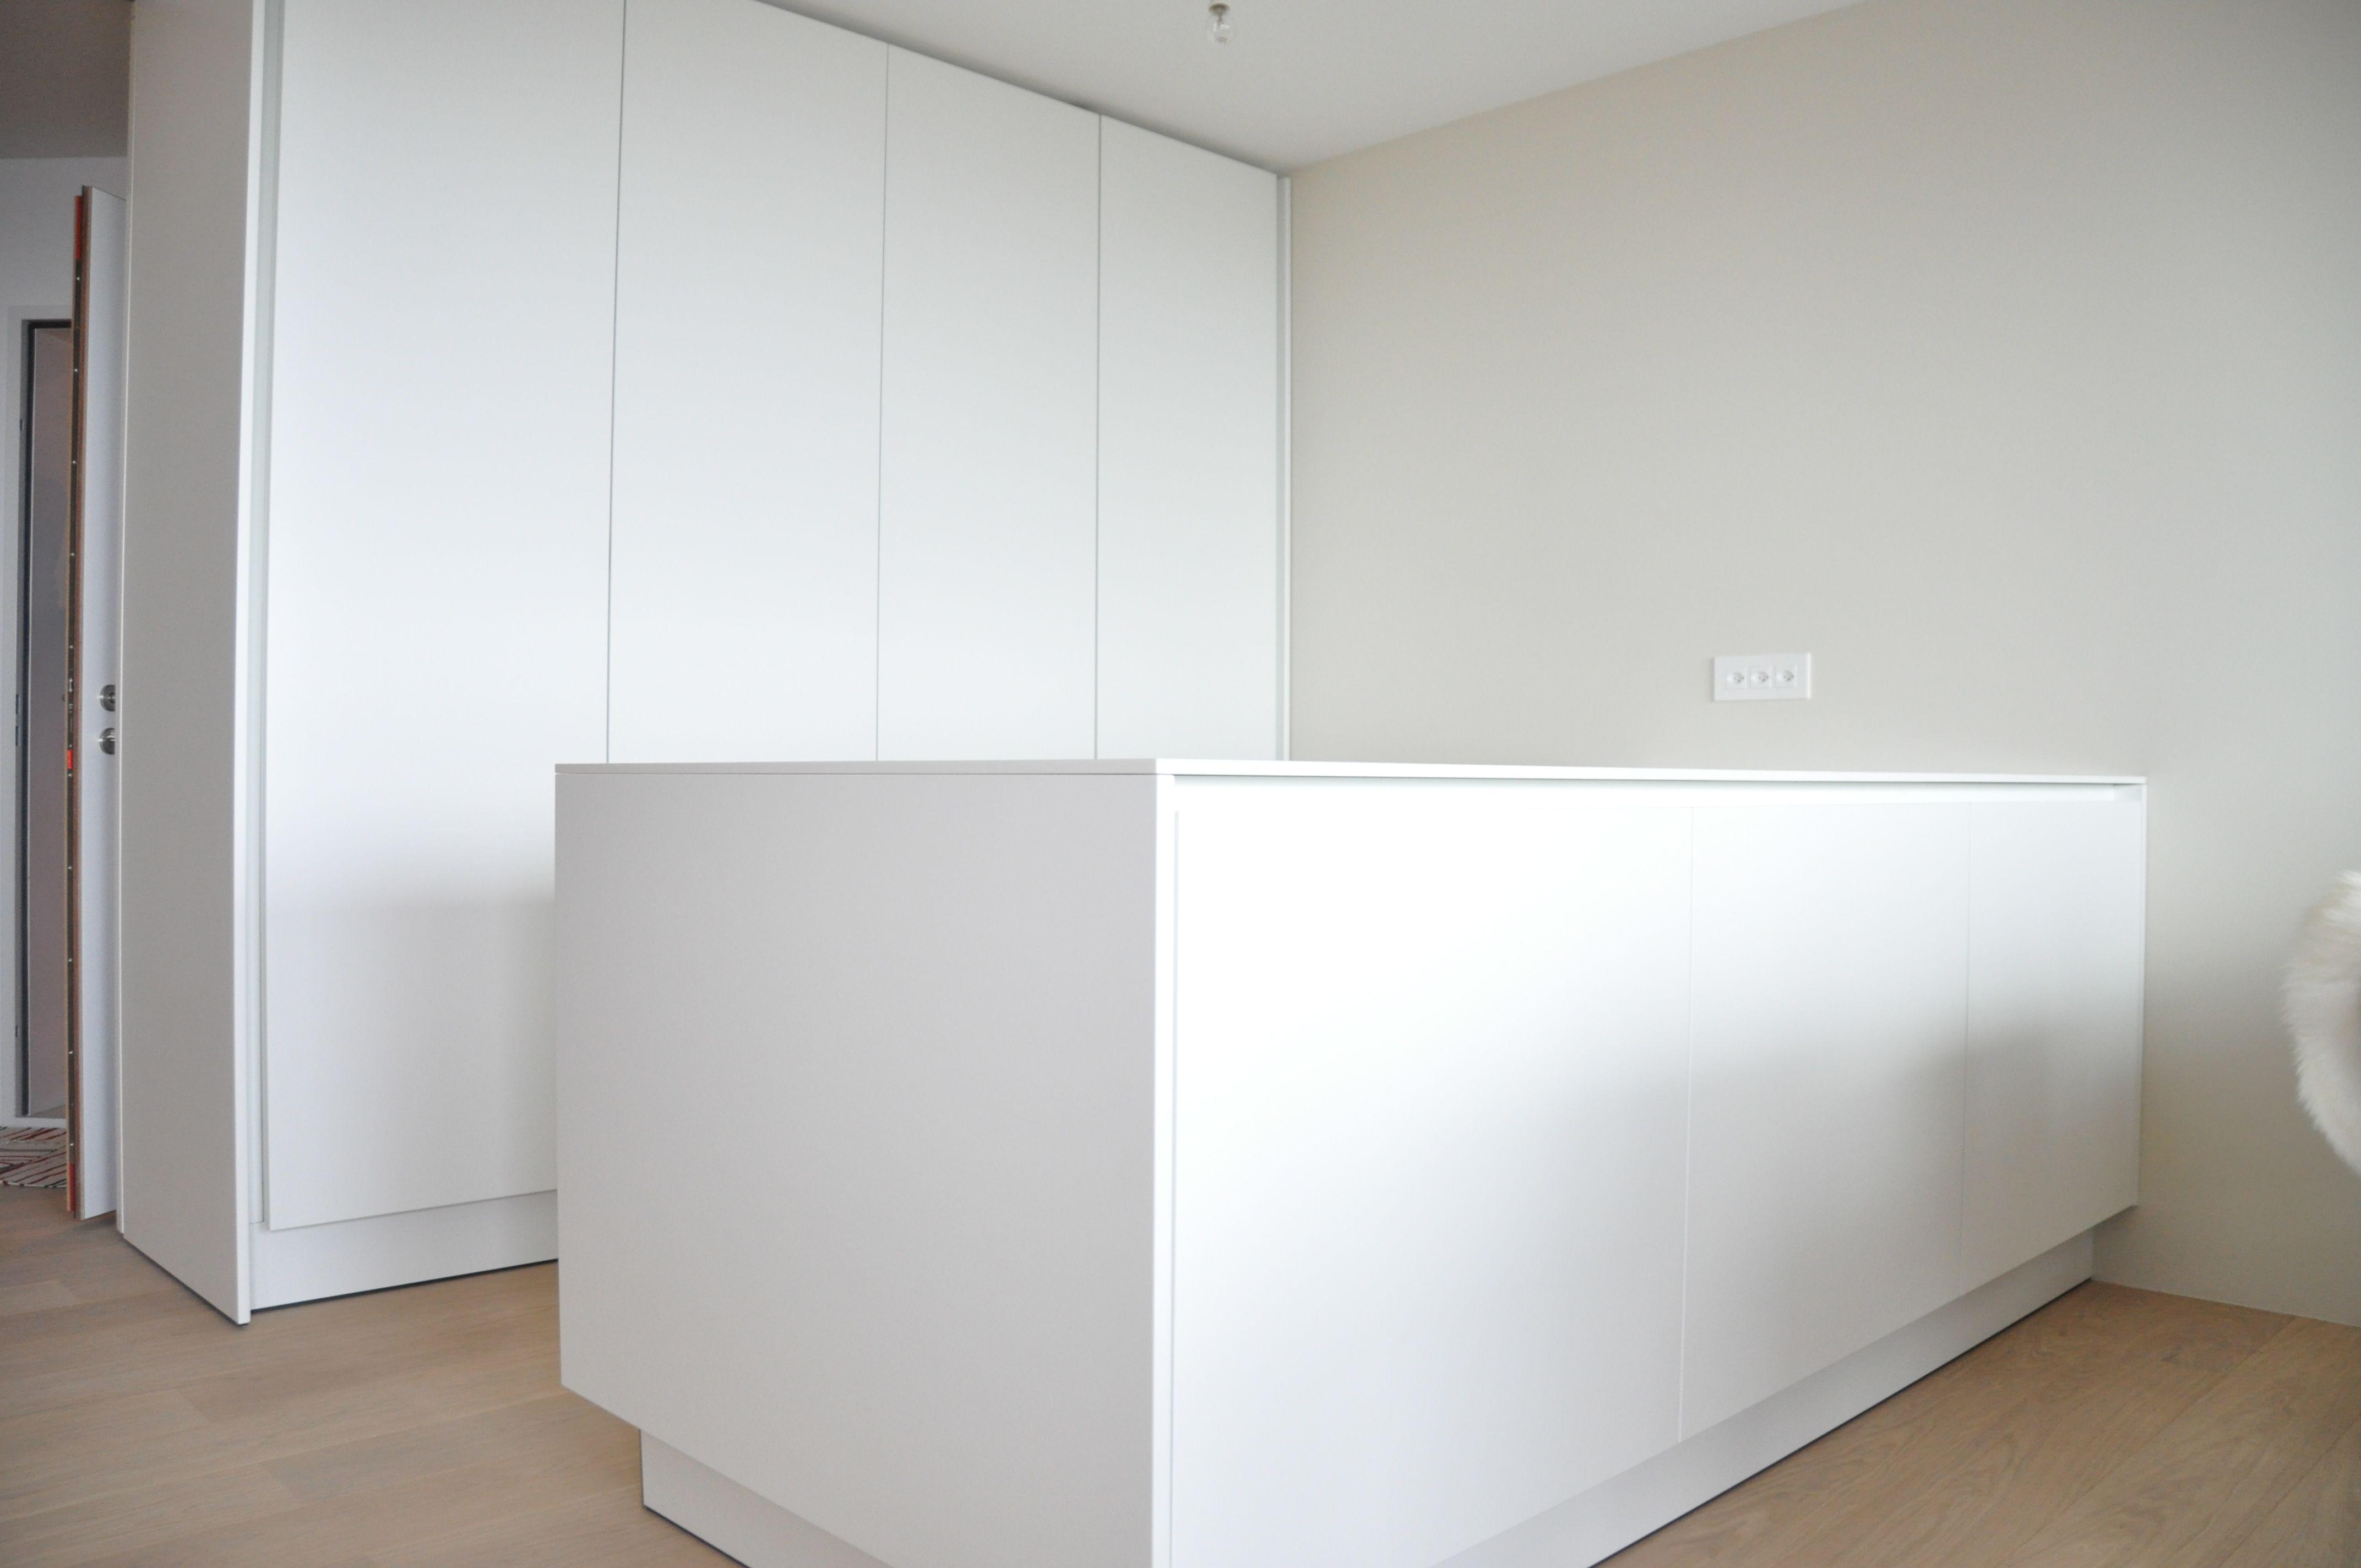 eggersmann e sign kundenk che wei mit corian. Black Bedroom Furniture Sets. Home Design Ideas